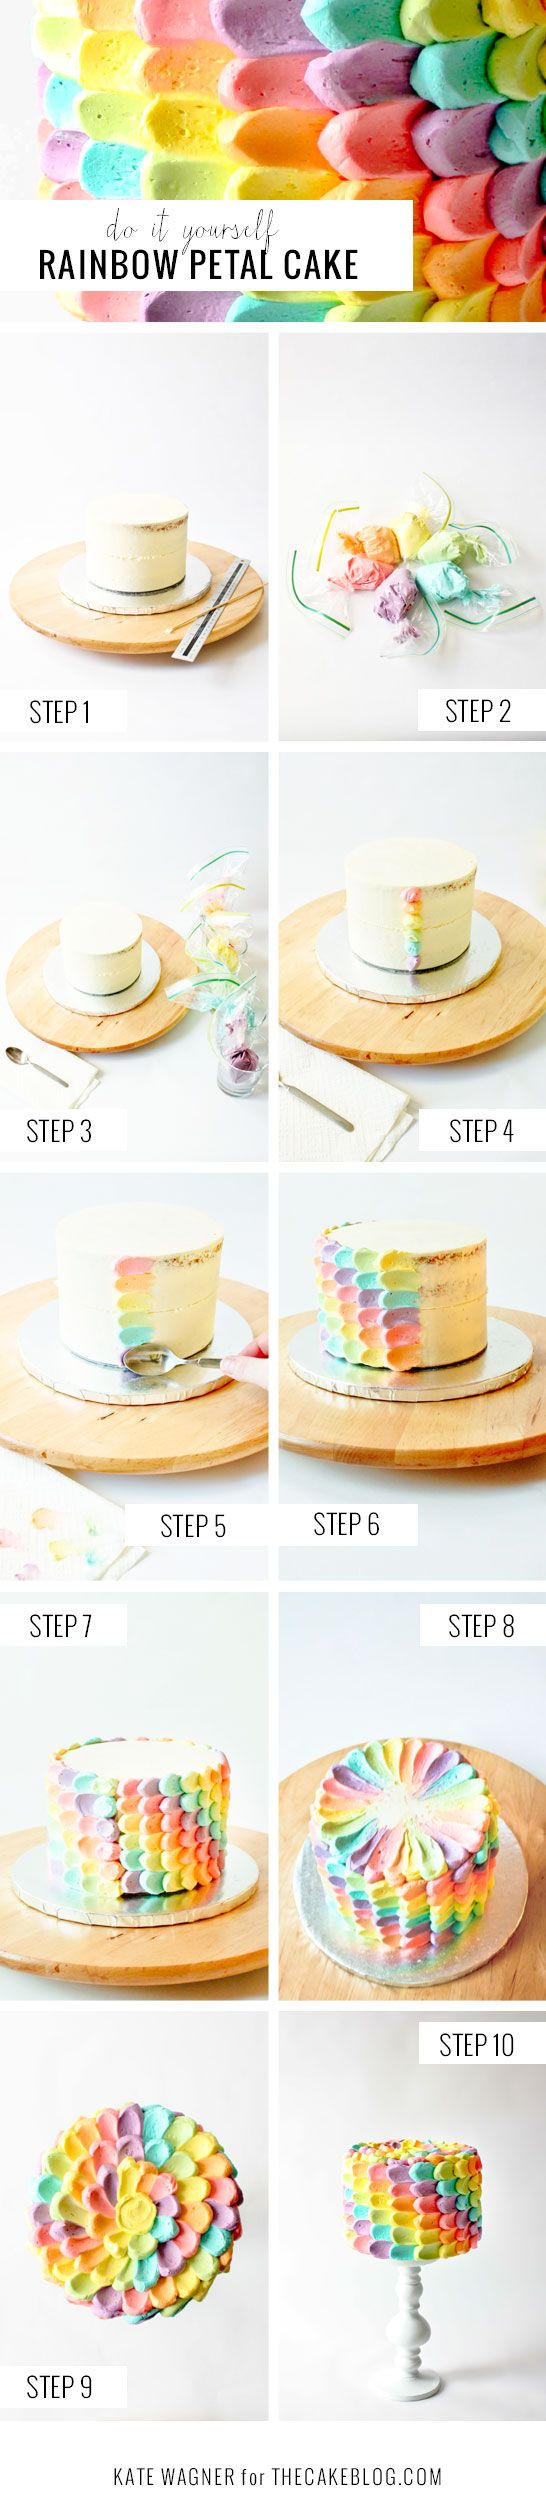 Rainbow Petal Cake Step by Step